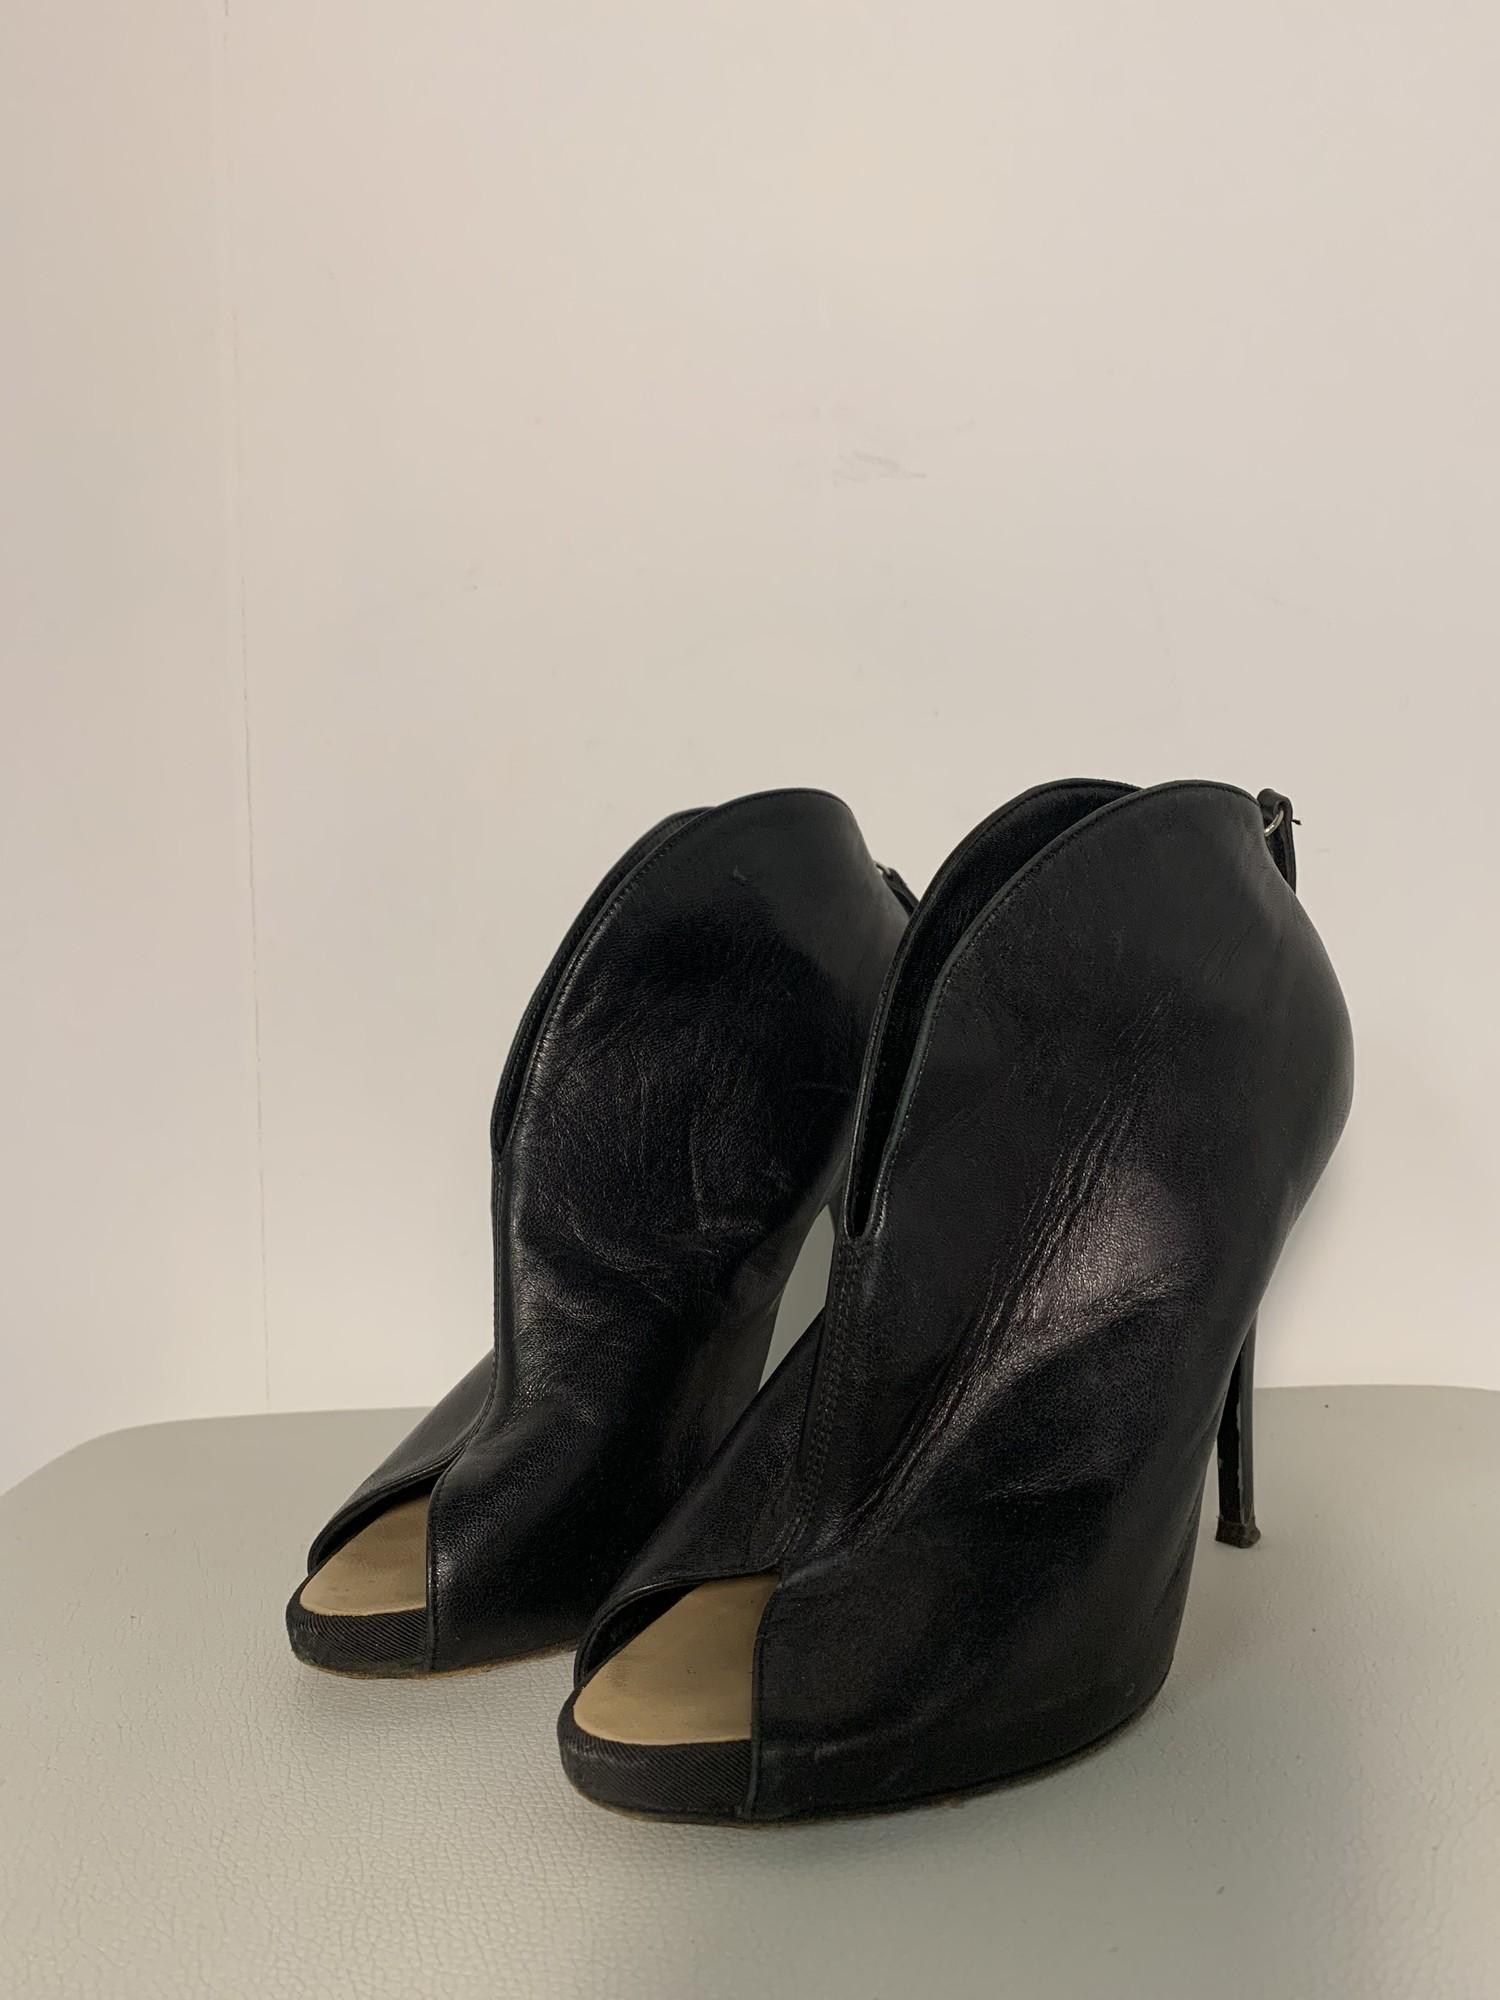 Guiseppe Zanotti- 36.5, Solid, Size: Black